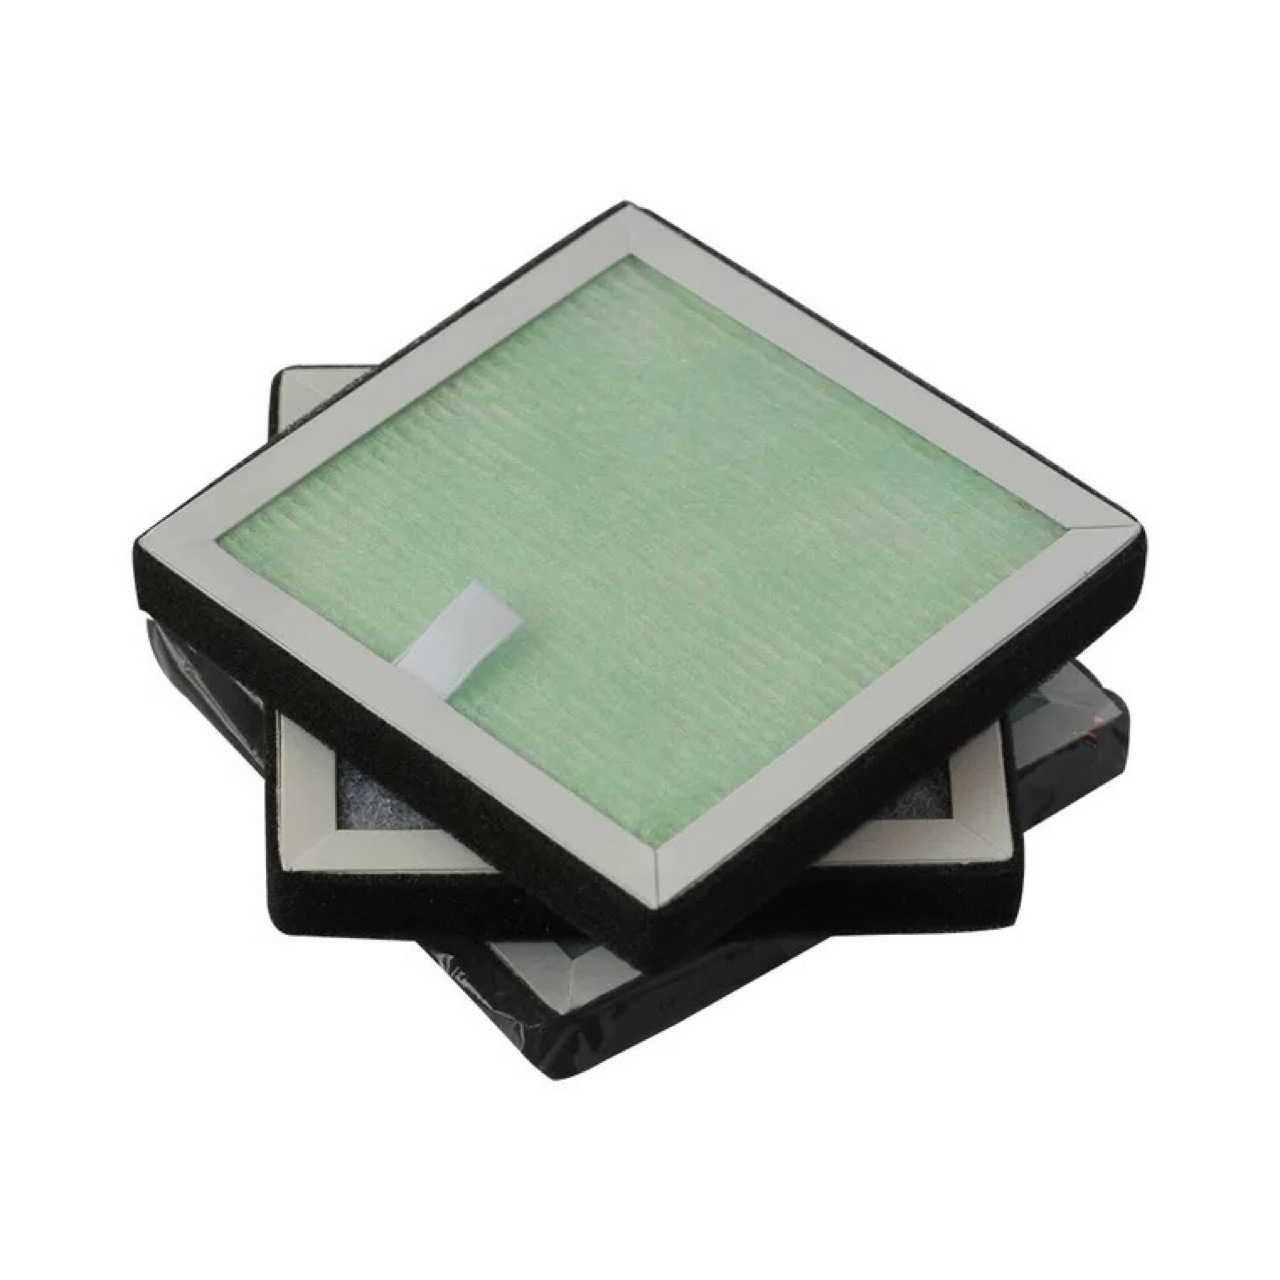 [u[4166737615]空气净化,氧吧]专拍烟灰缸空气净化器滤网 二手烟滤网月销量0件仅售53.2元